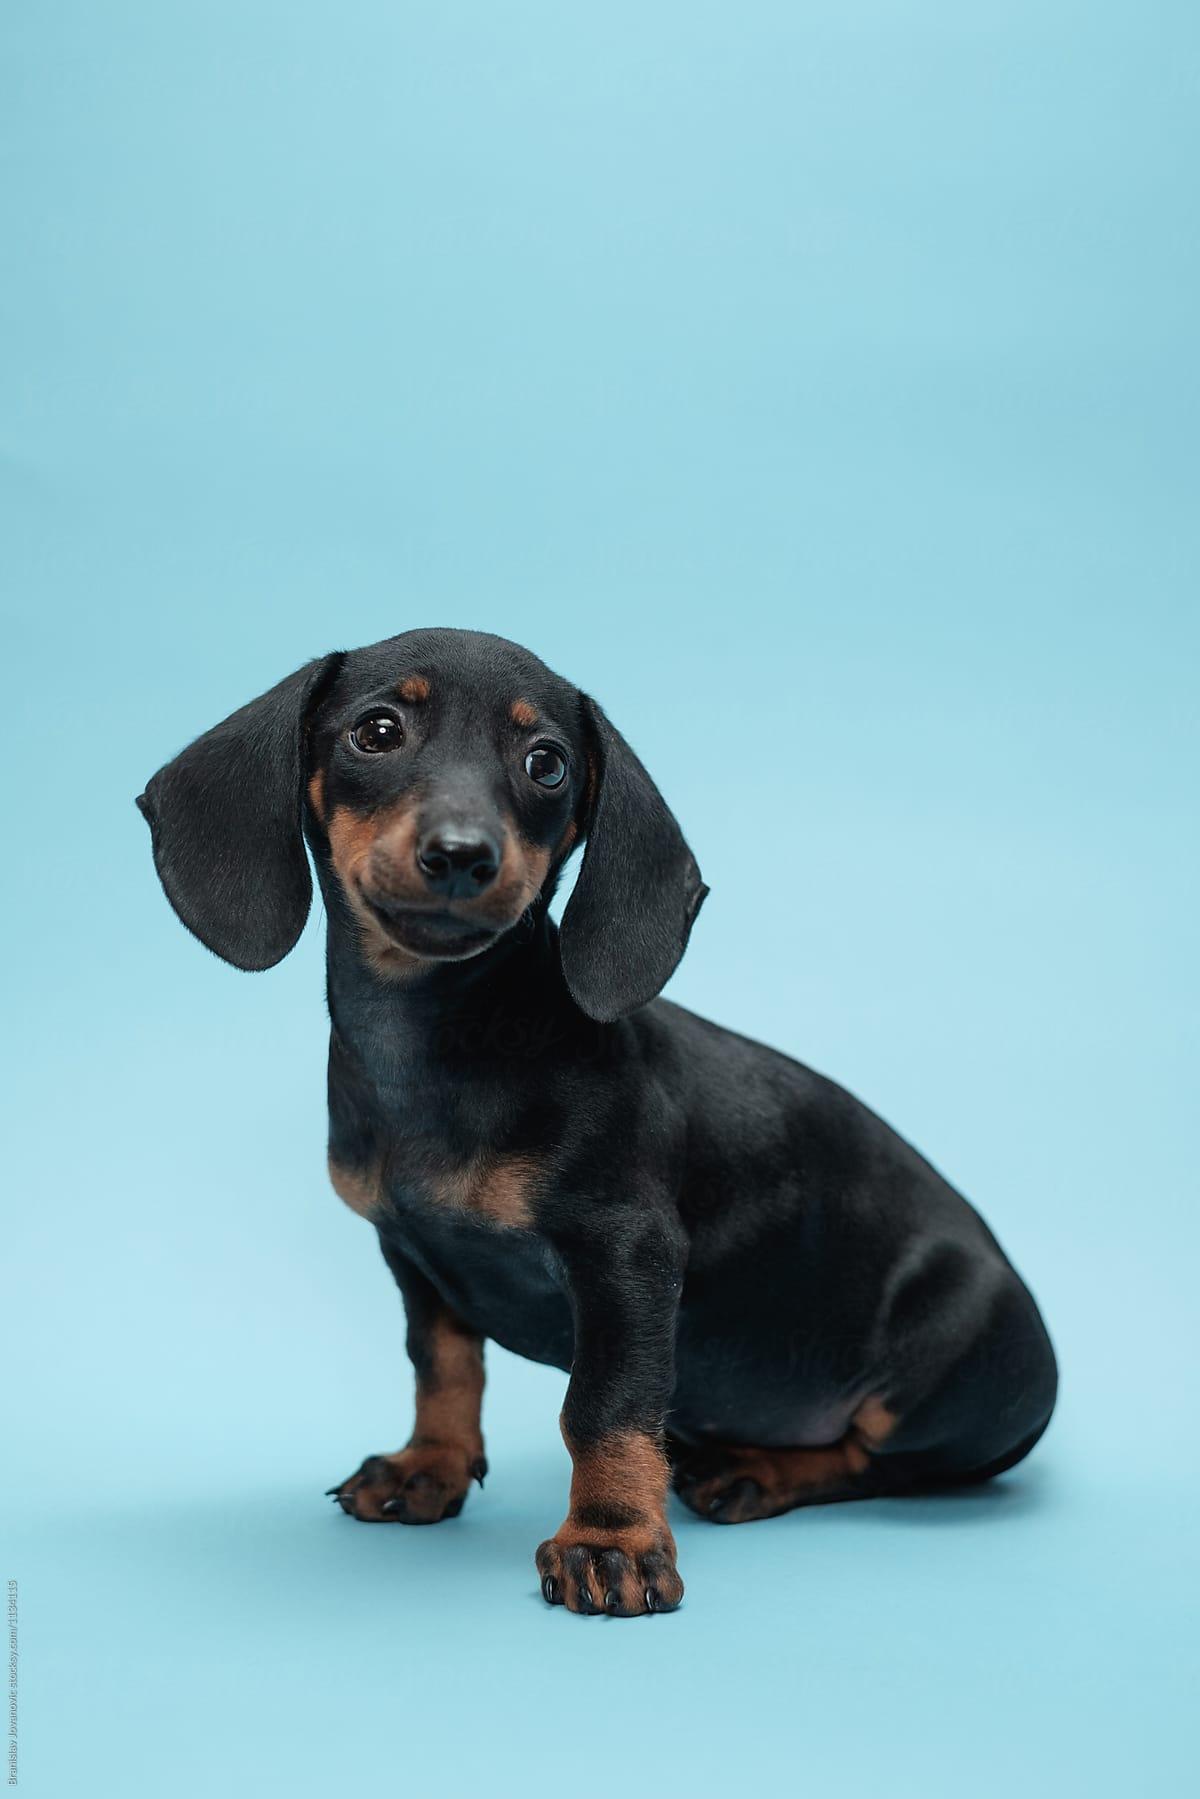 Cute Dachshund Puppy Portrait Por Brkati Krokodil Dog Dachshund Stocksy United